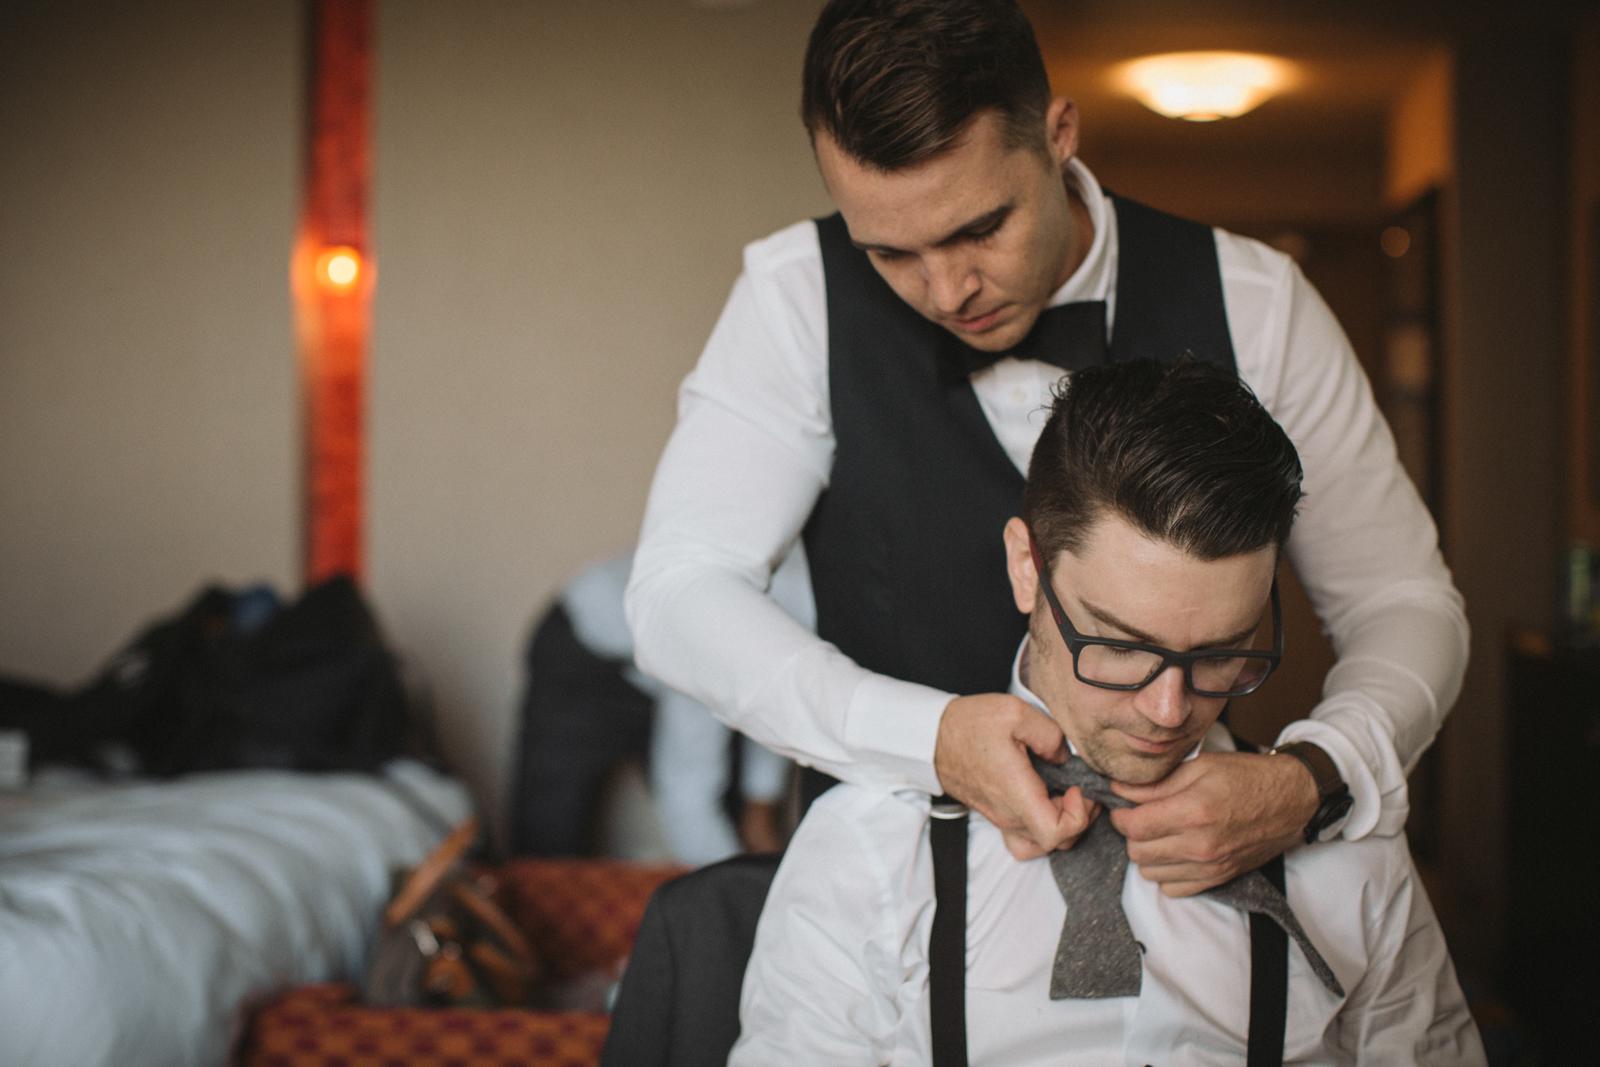 BeanandCole.com-Chris&JackieJohnson-Wedding-6.jpg